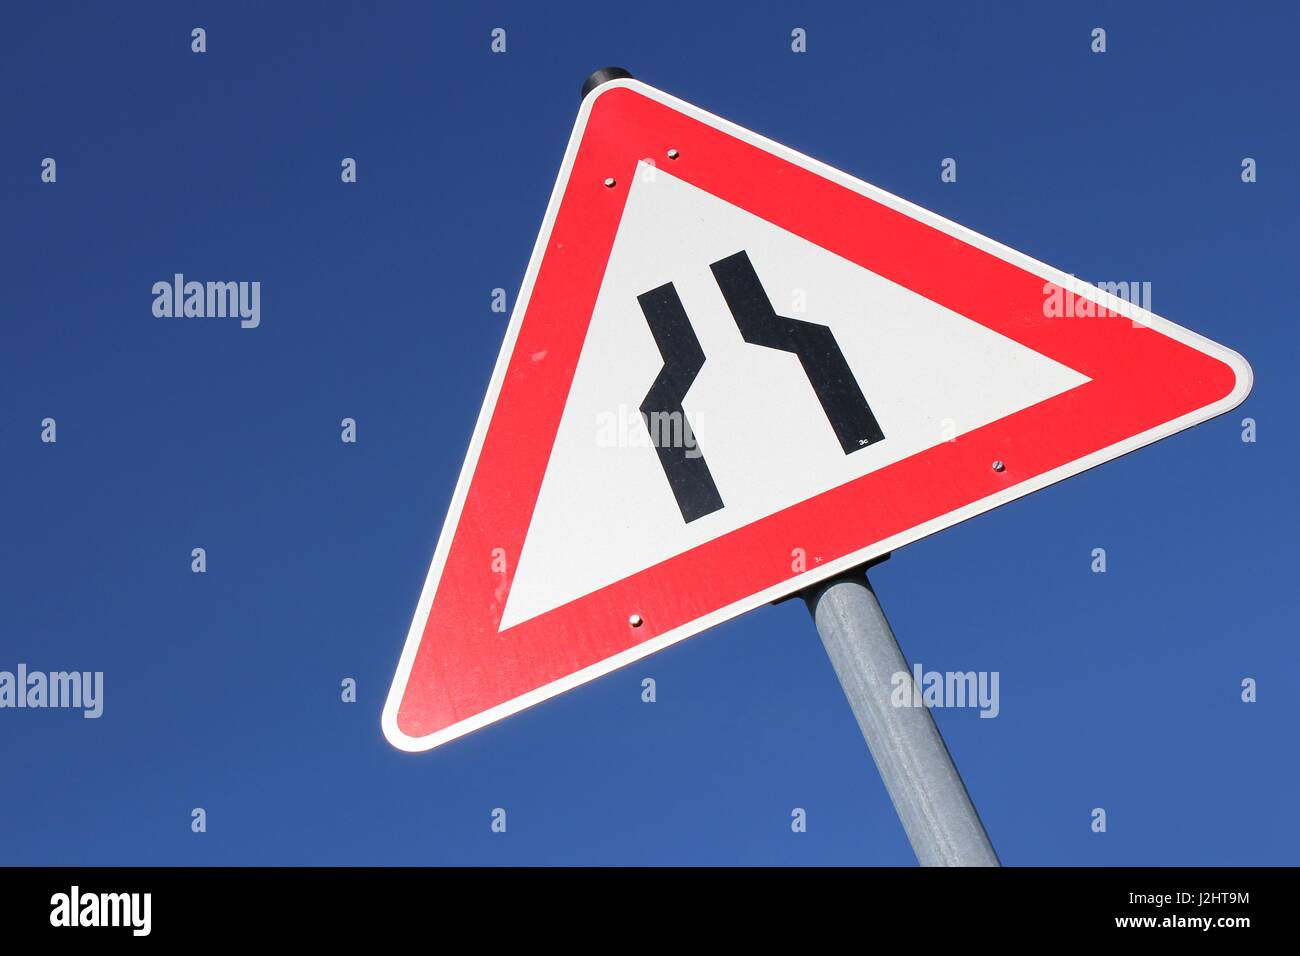 German road sign: road narrows, both sides, narrow, bottleneck, construction site, roadworks, warning, triangular - Stock Image